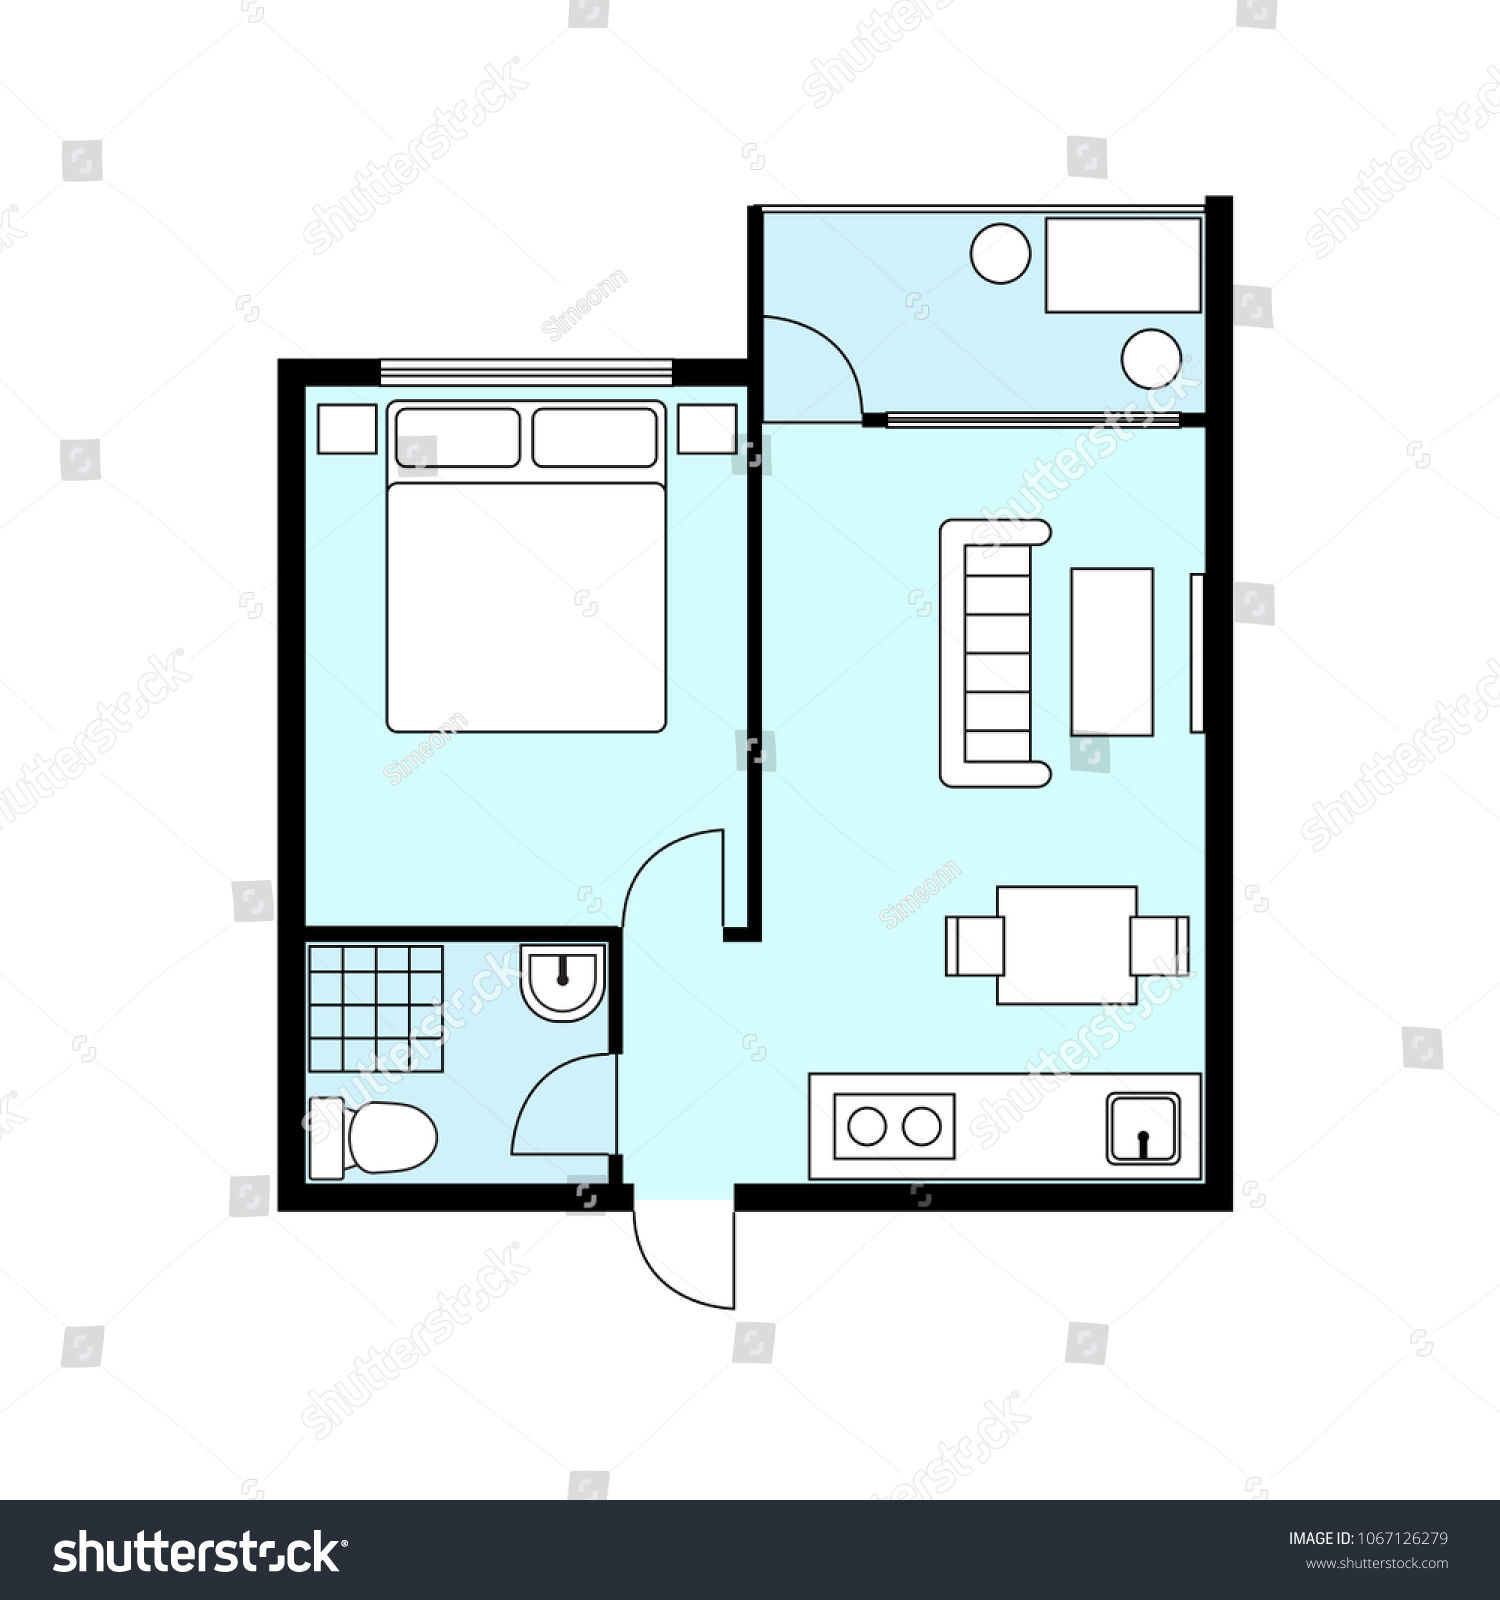 Floor Plan Architectural Vector Illustration 1 Stock Vector Royalty Free 1067126279